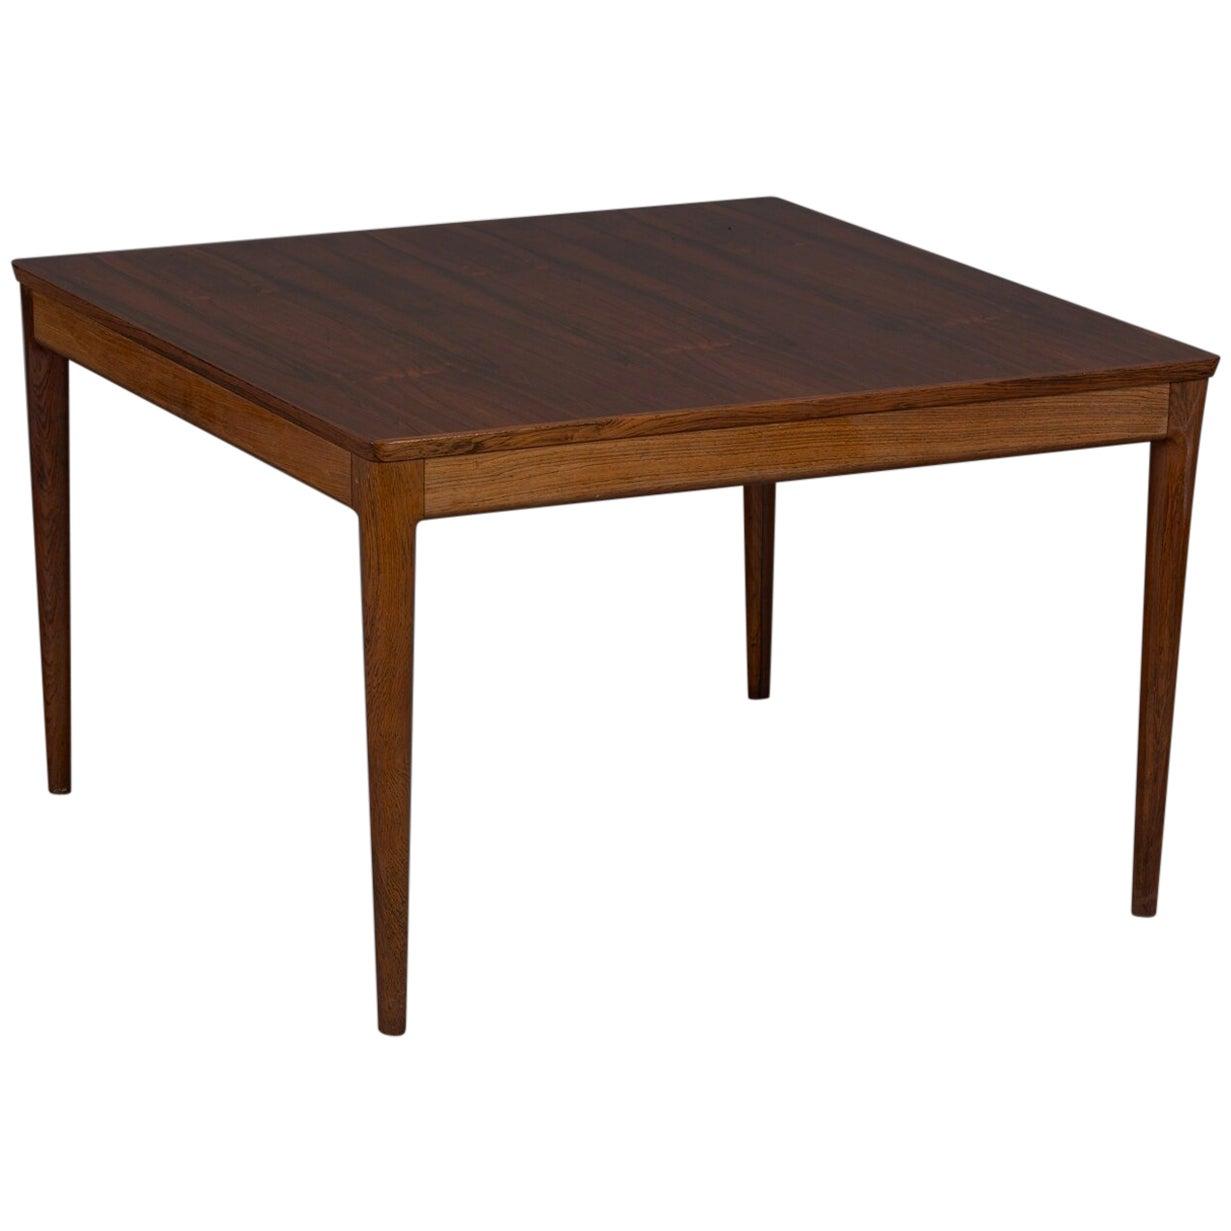 Square Danish Modern Mid-Century Rosewood Coffee Table